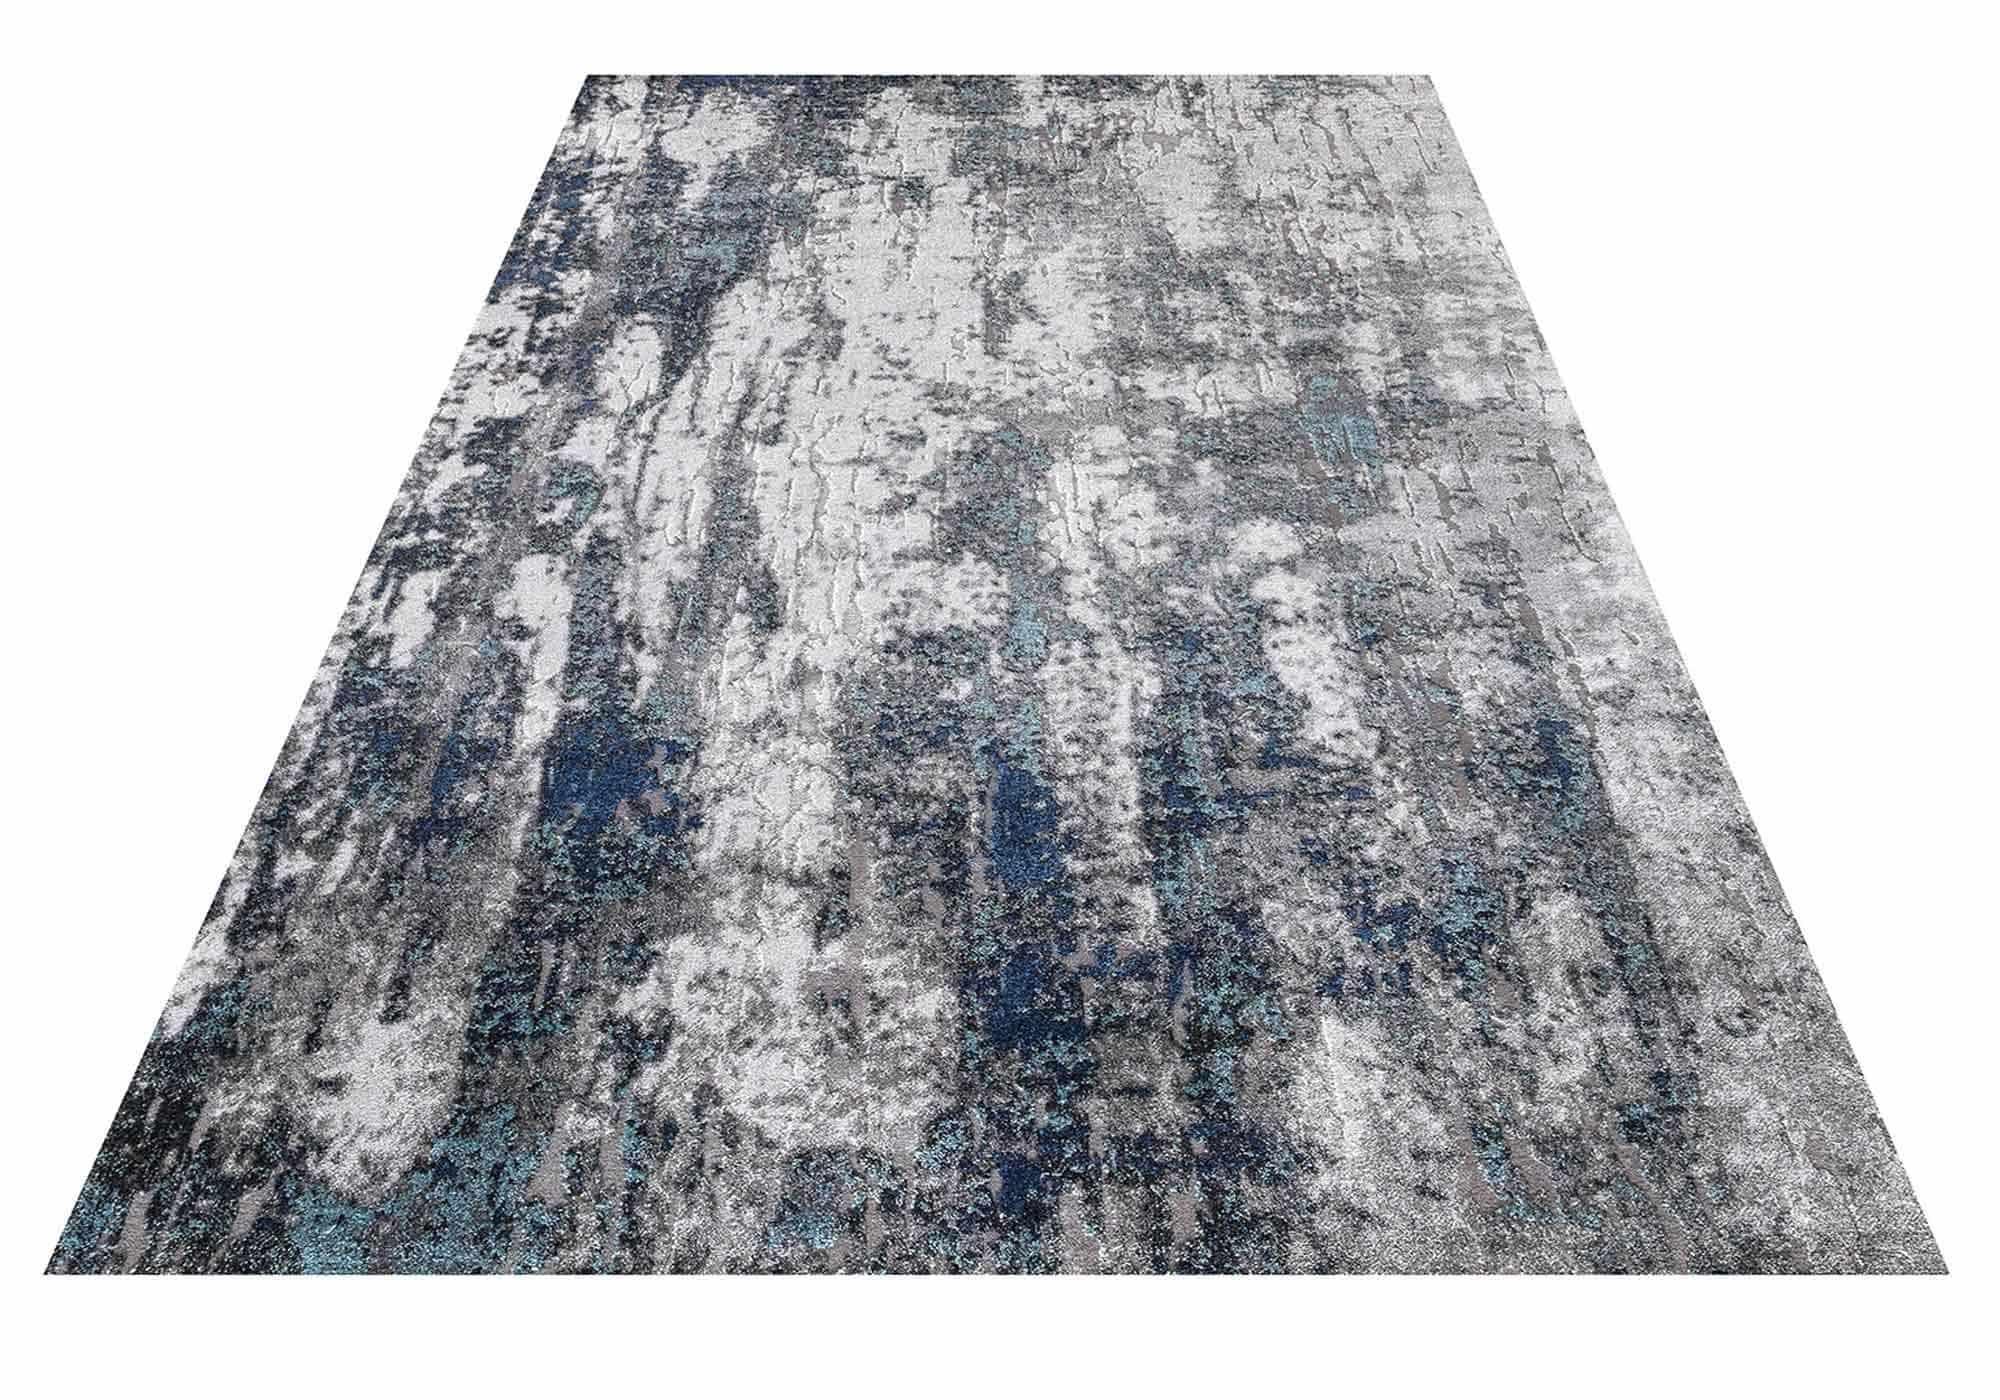 Teppich 120 x 170 cm - Hoch-Tief-Effekt - Mumbai 130 Blue